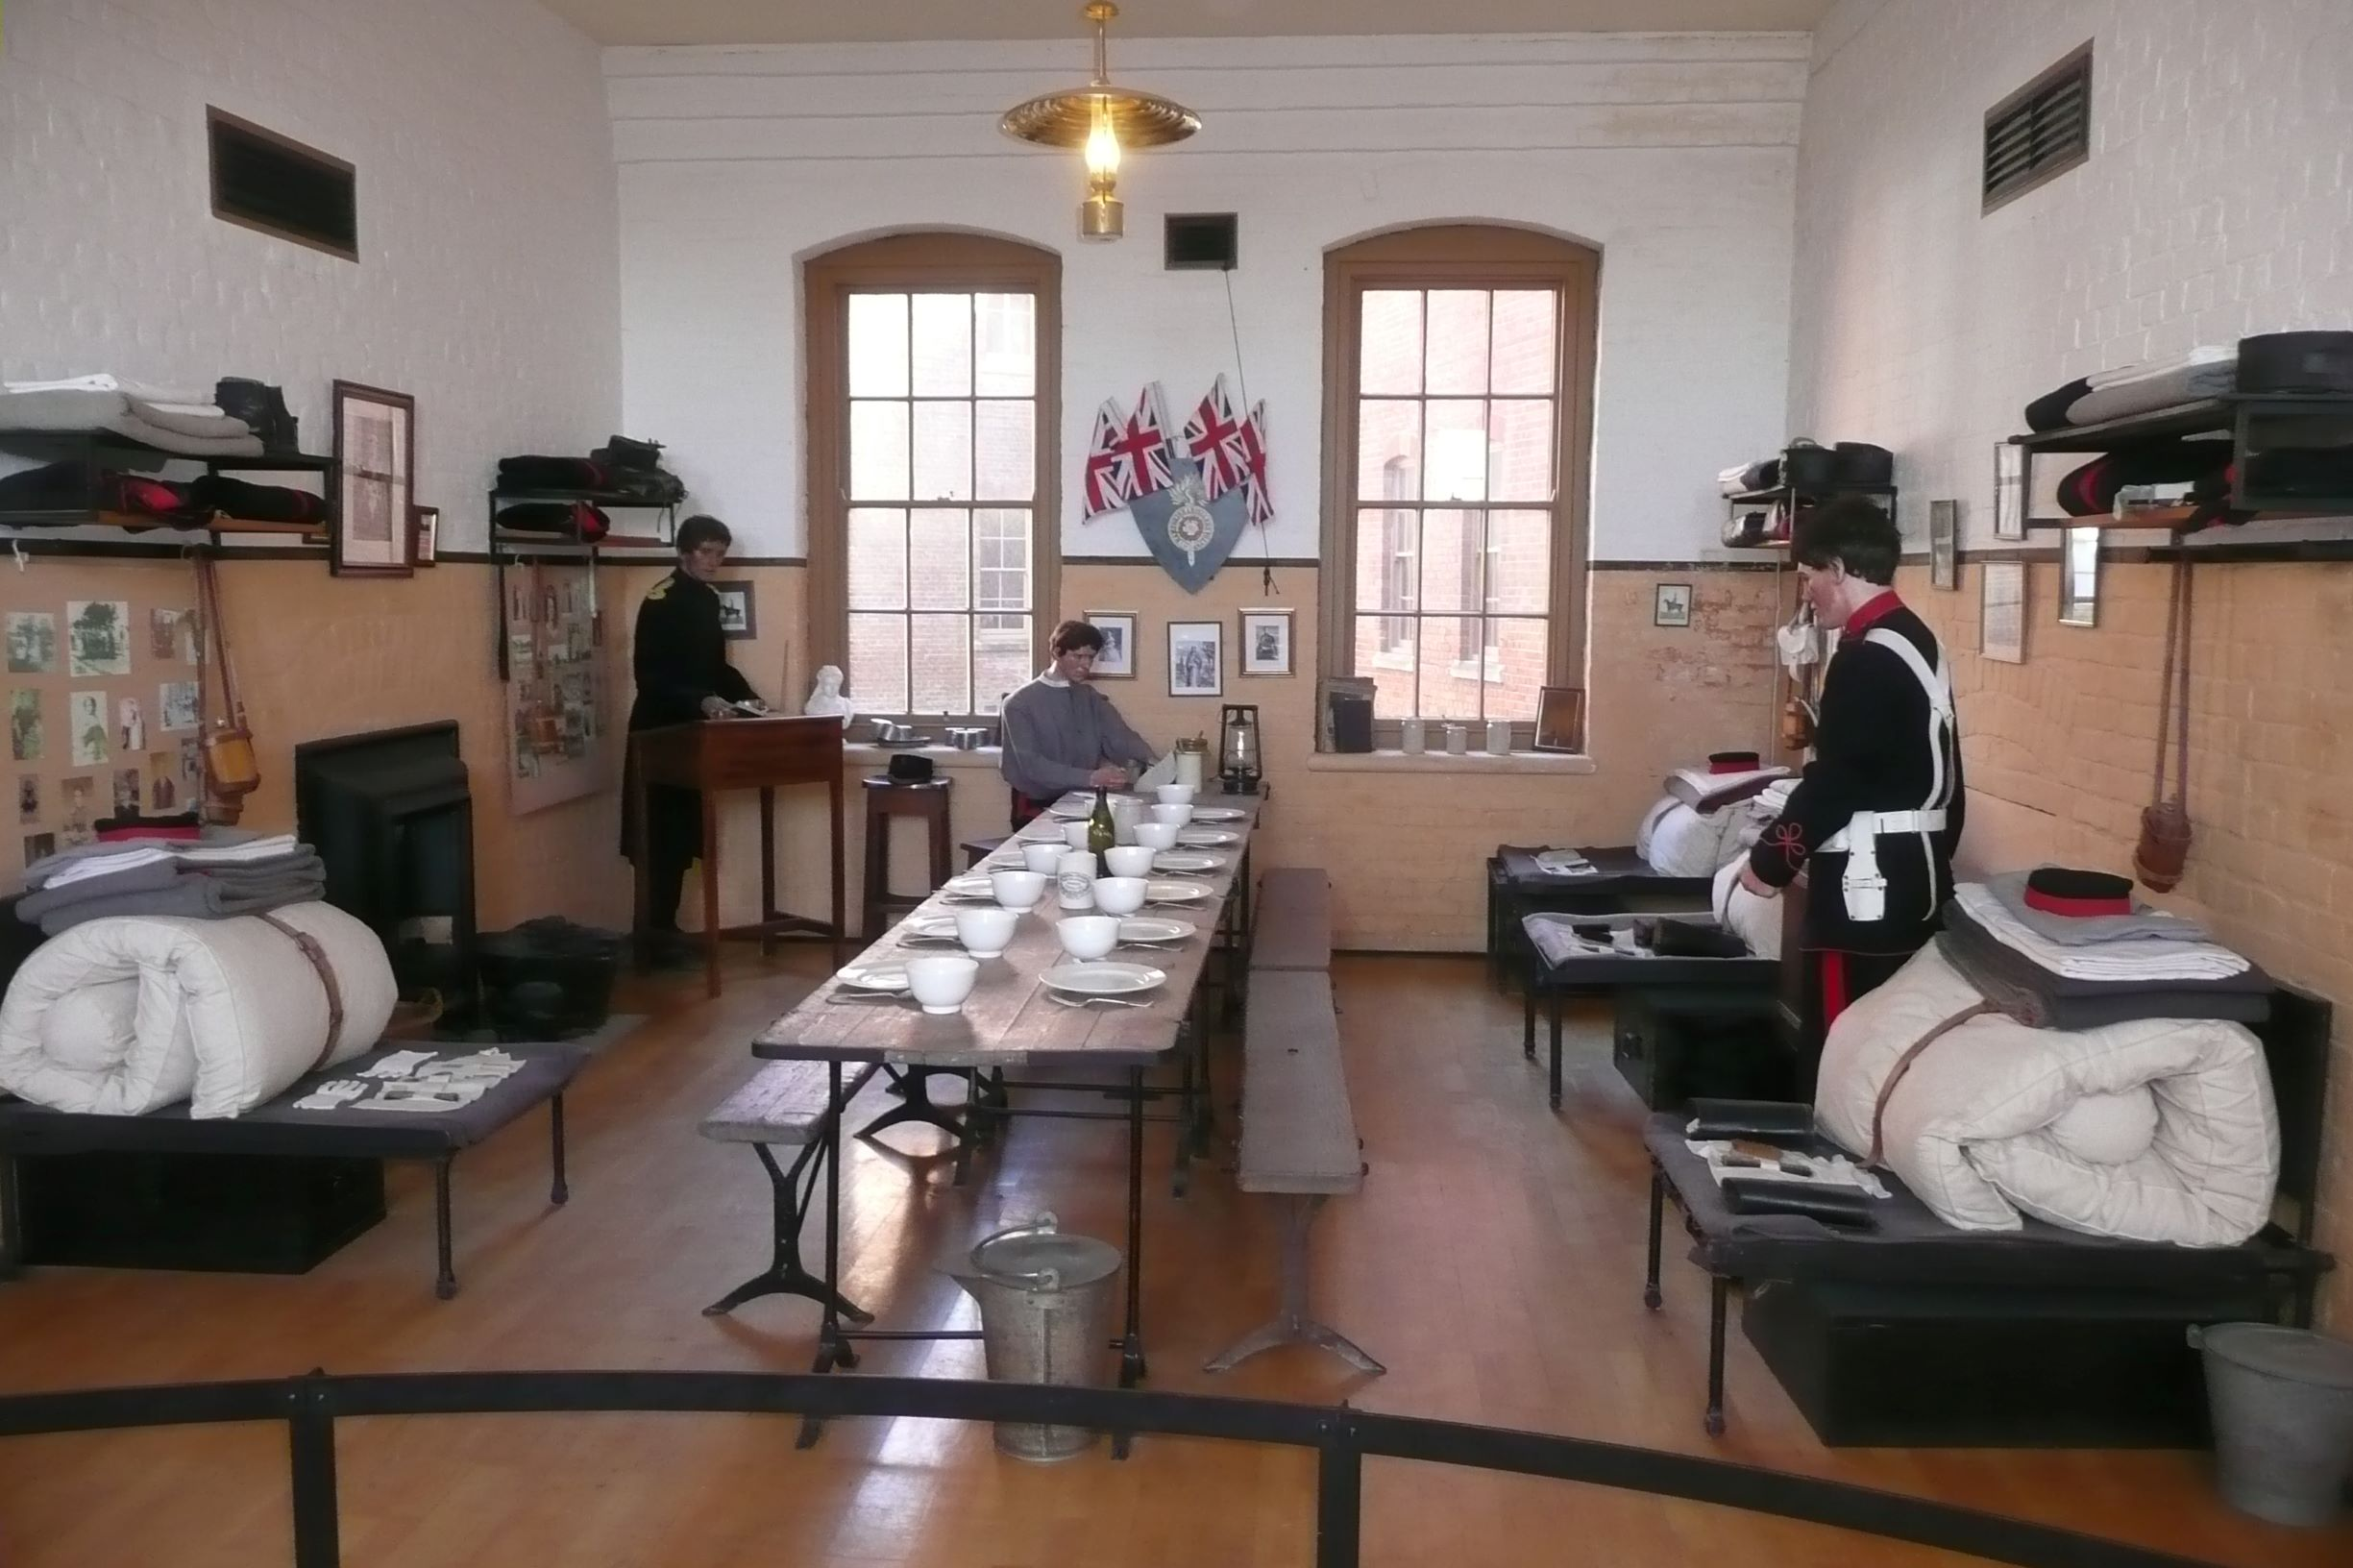 katonai barakkok - étkezde